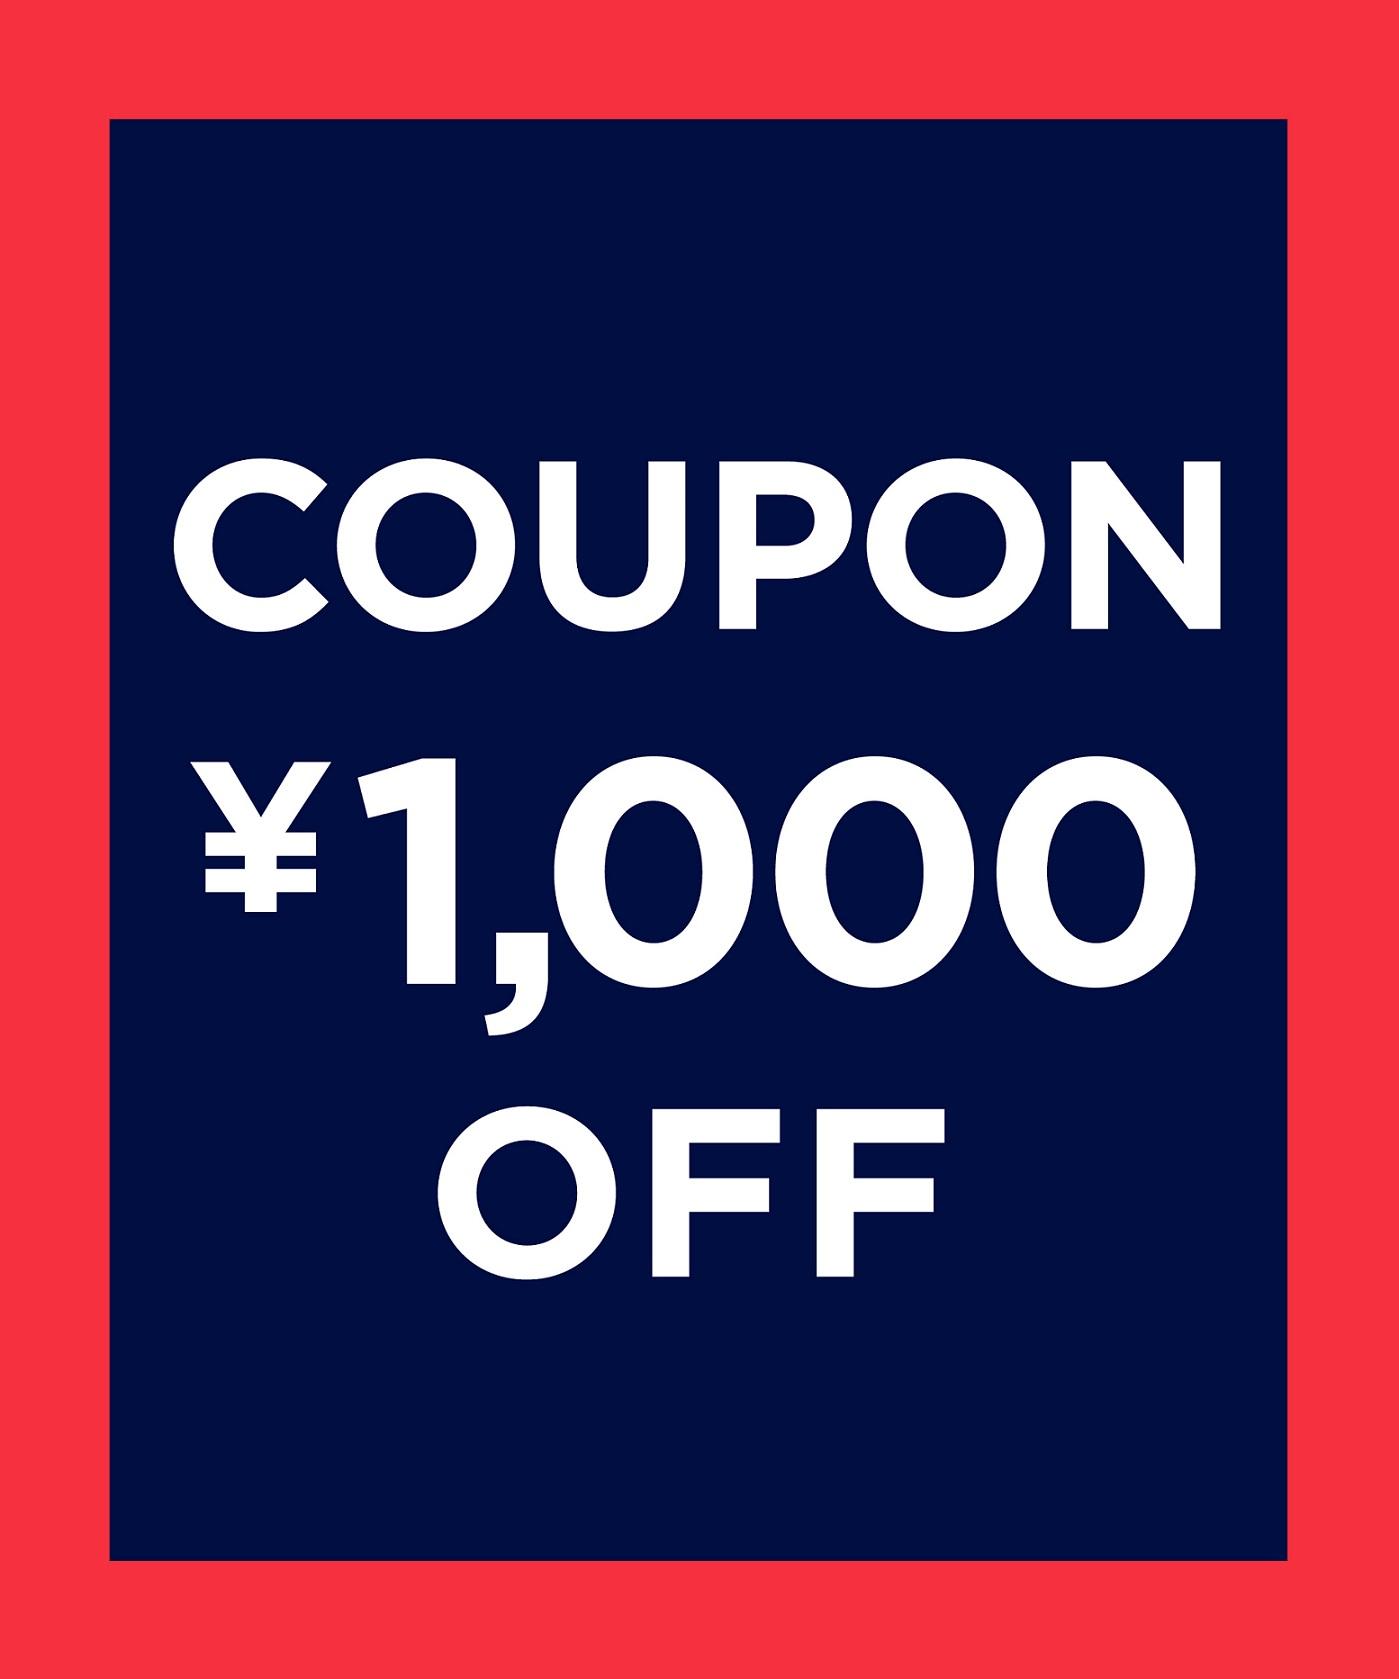 GAP(ギャップ)のショップニュース「【本日限定!!】1,000円オフクーポン発行!」